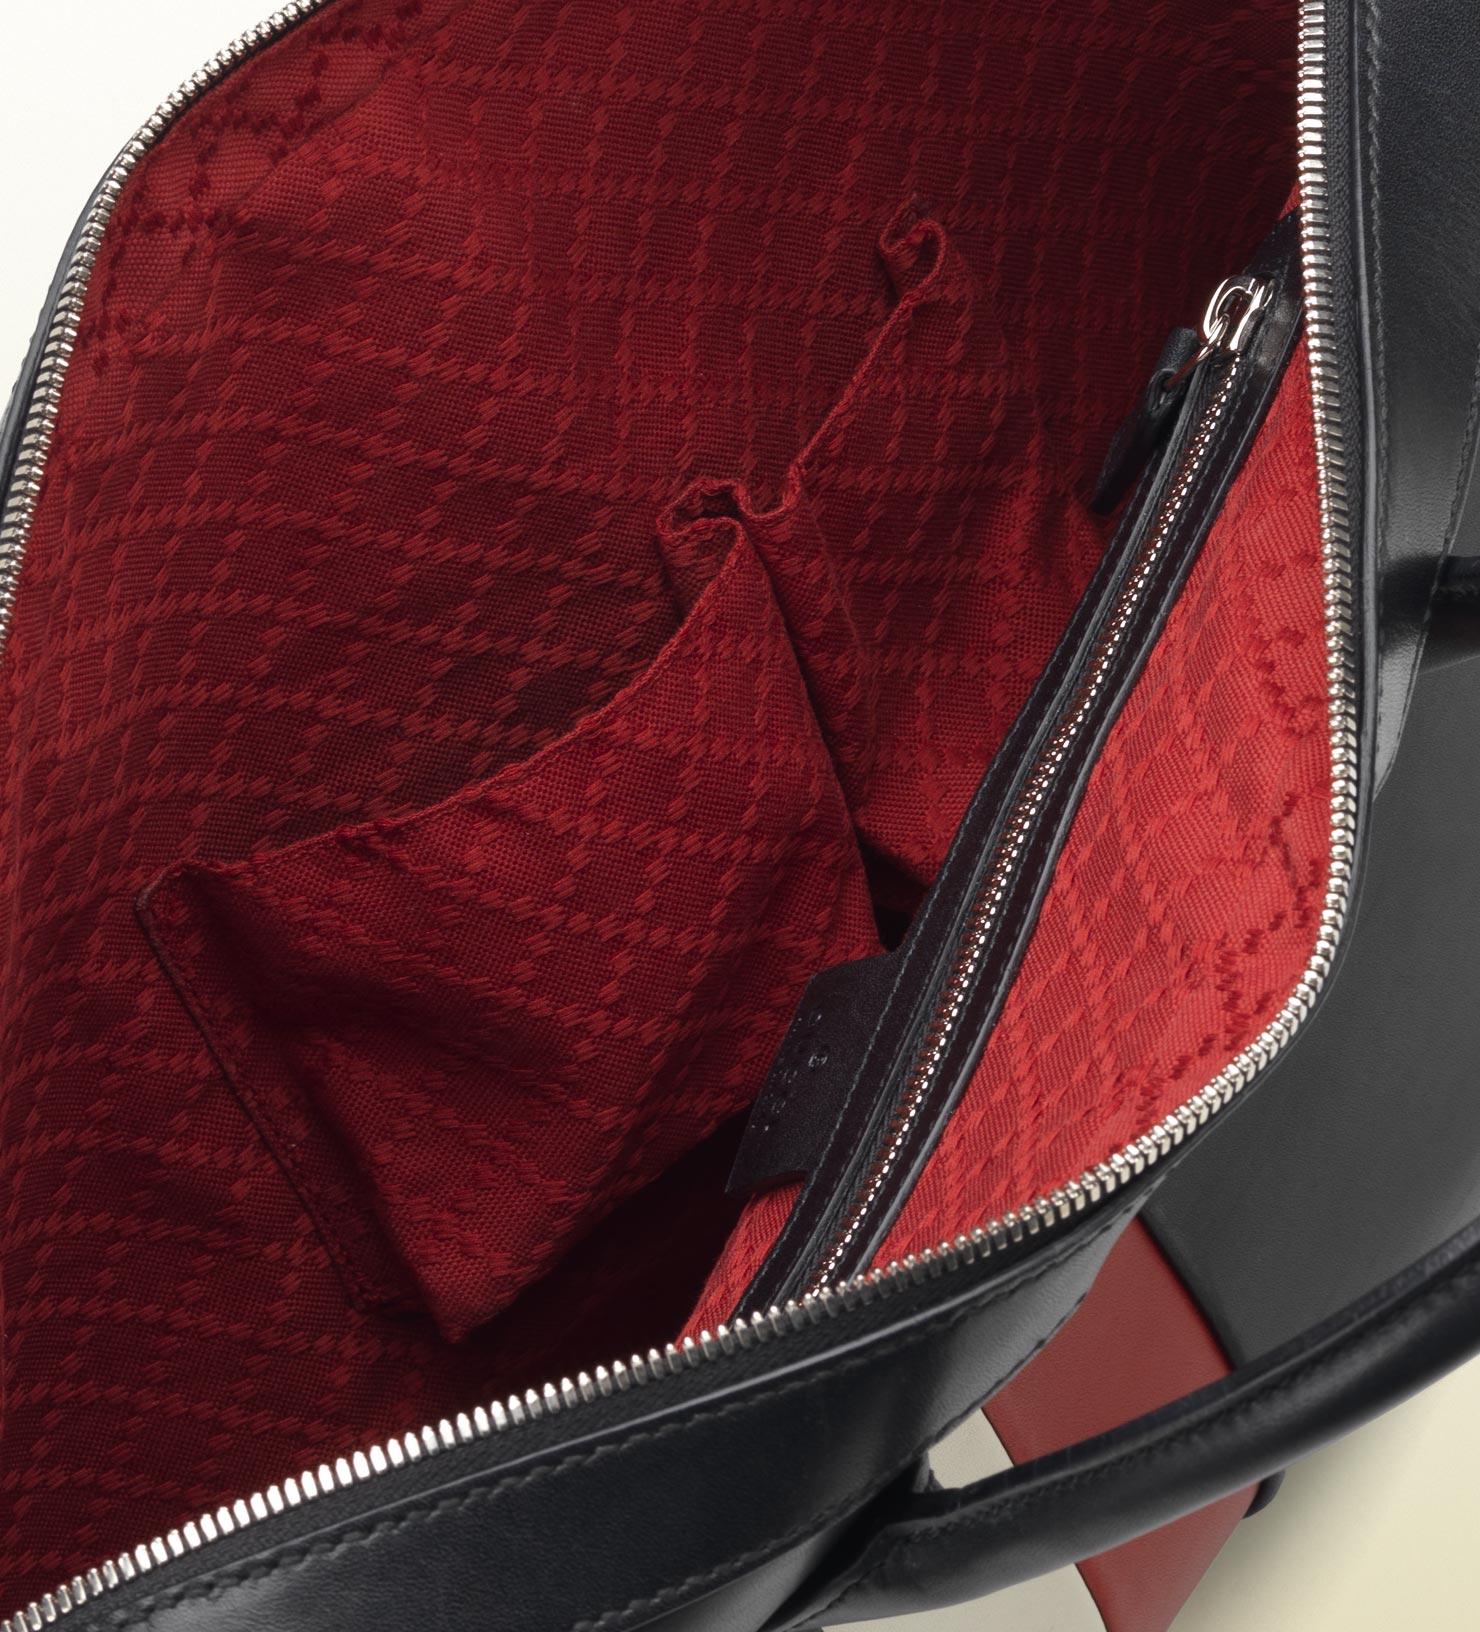 GUCCI men black leather briefcase red white 2